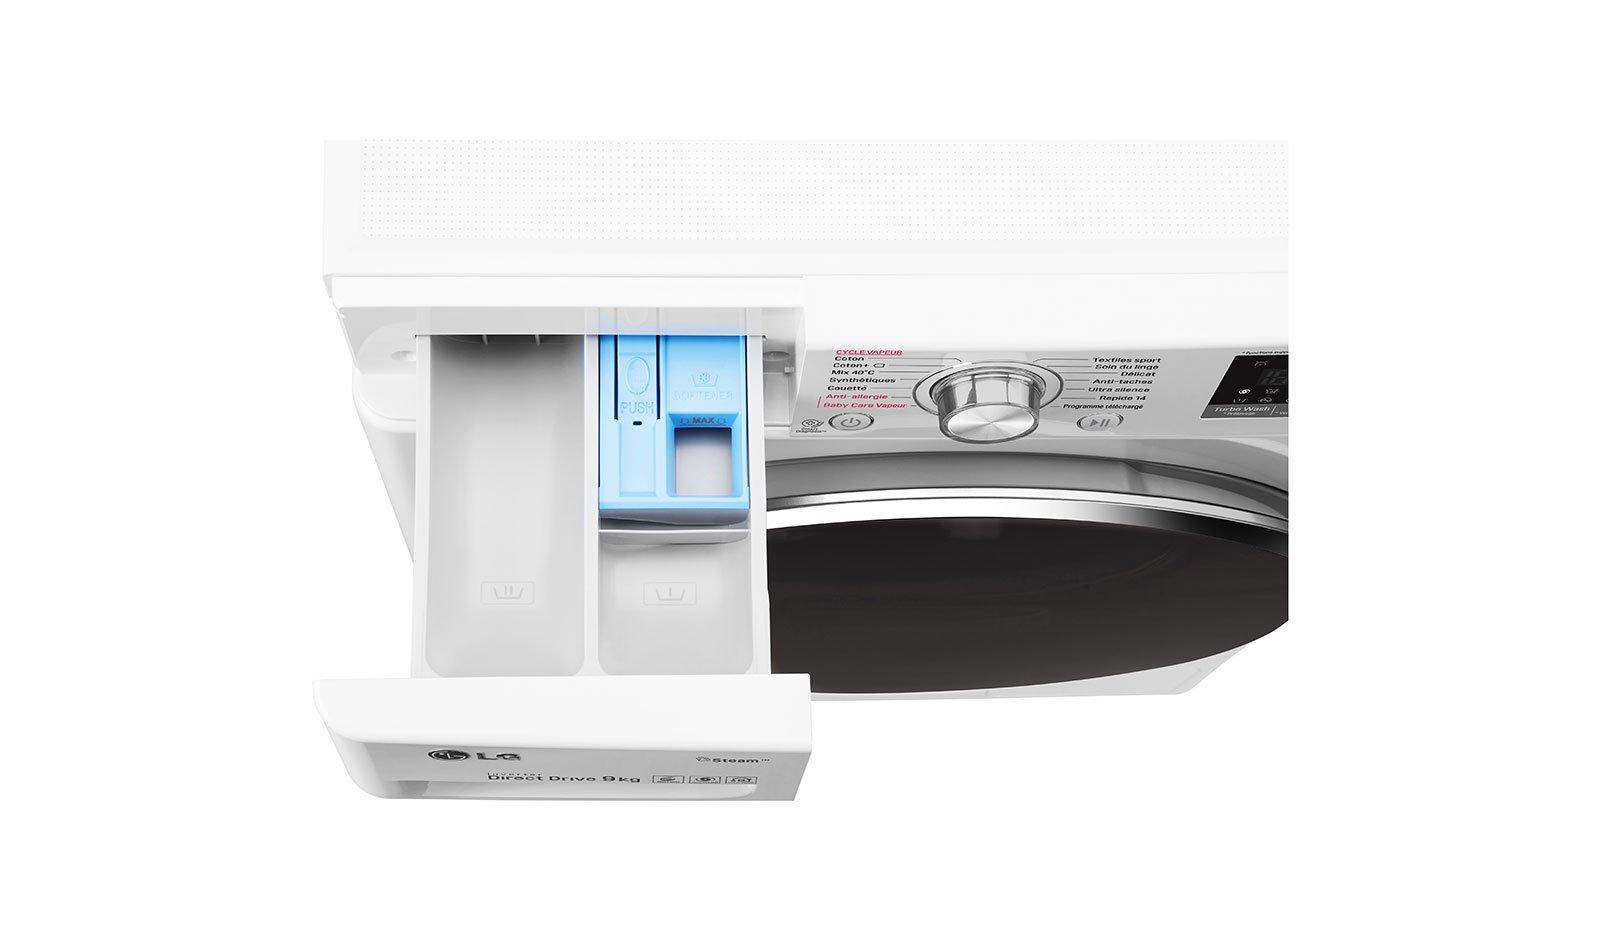 LG-f94j72whst-autonome-Belastung-Bevor-9-kg-1400trmin-A-Wei-Waschmaschine-Waschmaschinen-autonome-bevor-Belastung-wei-Knpfe-drehbar-Oberflche-links-LED